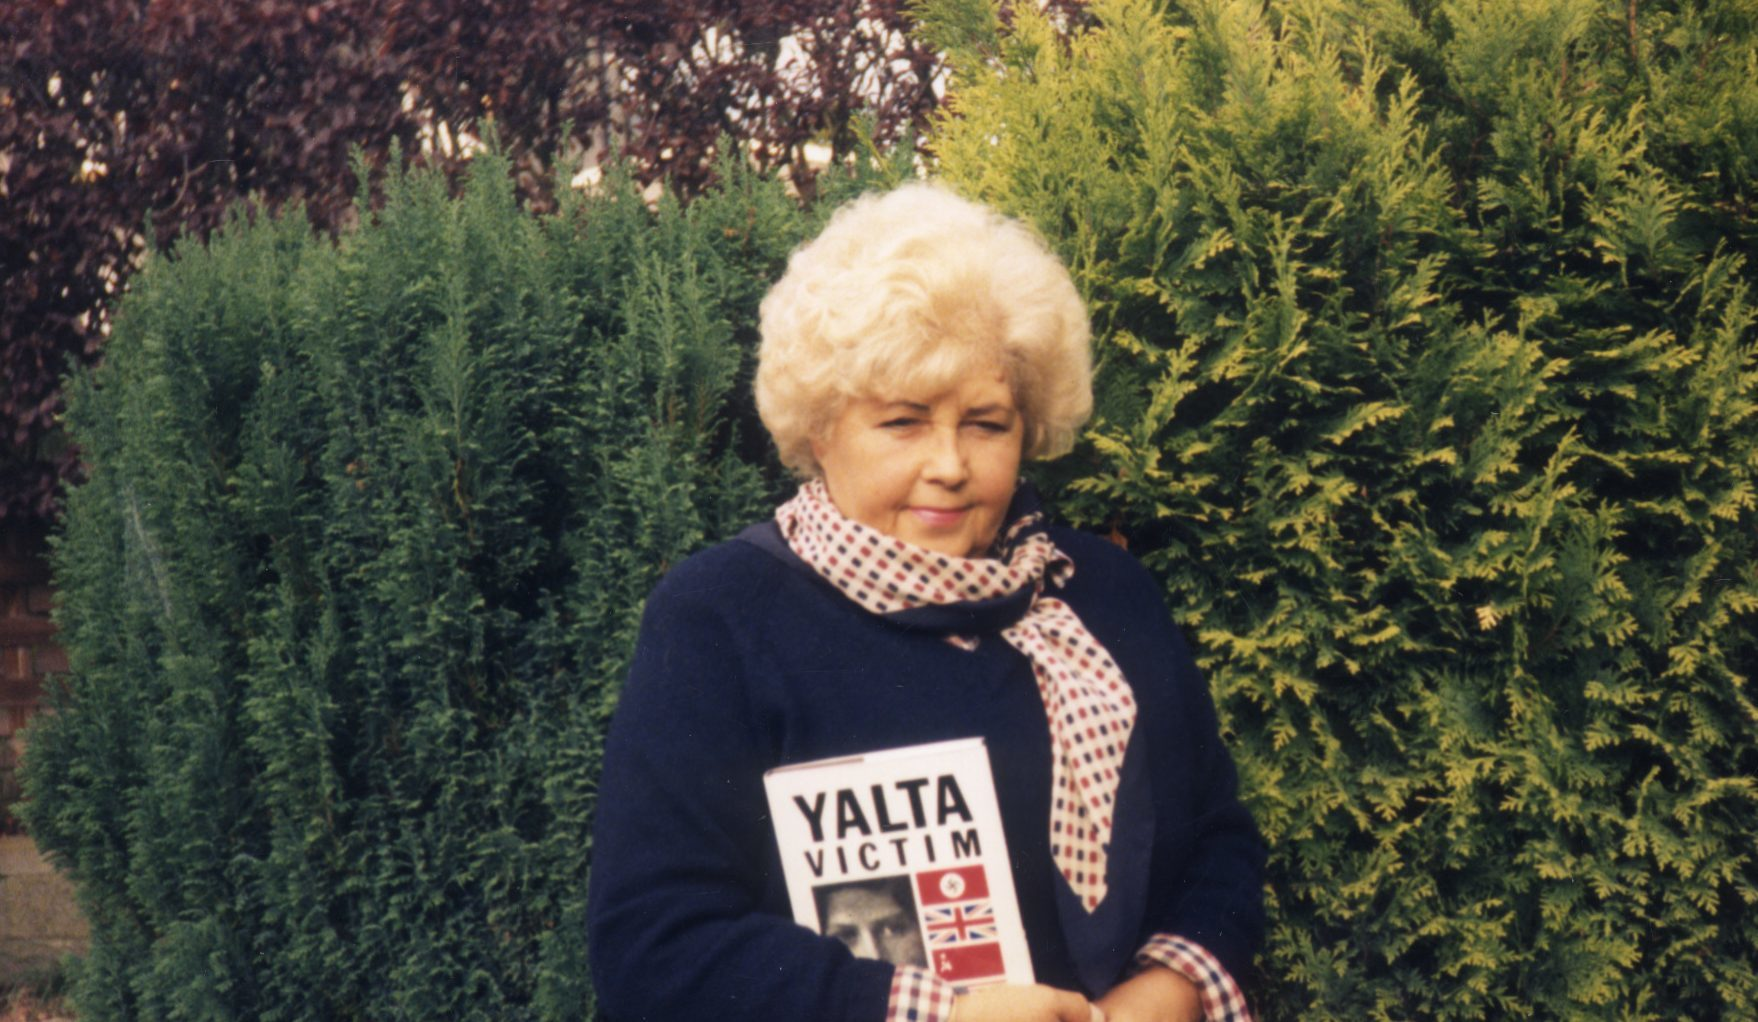 Zoe's book tells of her extraordinary escape from Nazi oppression.